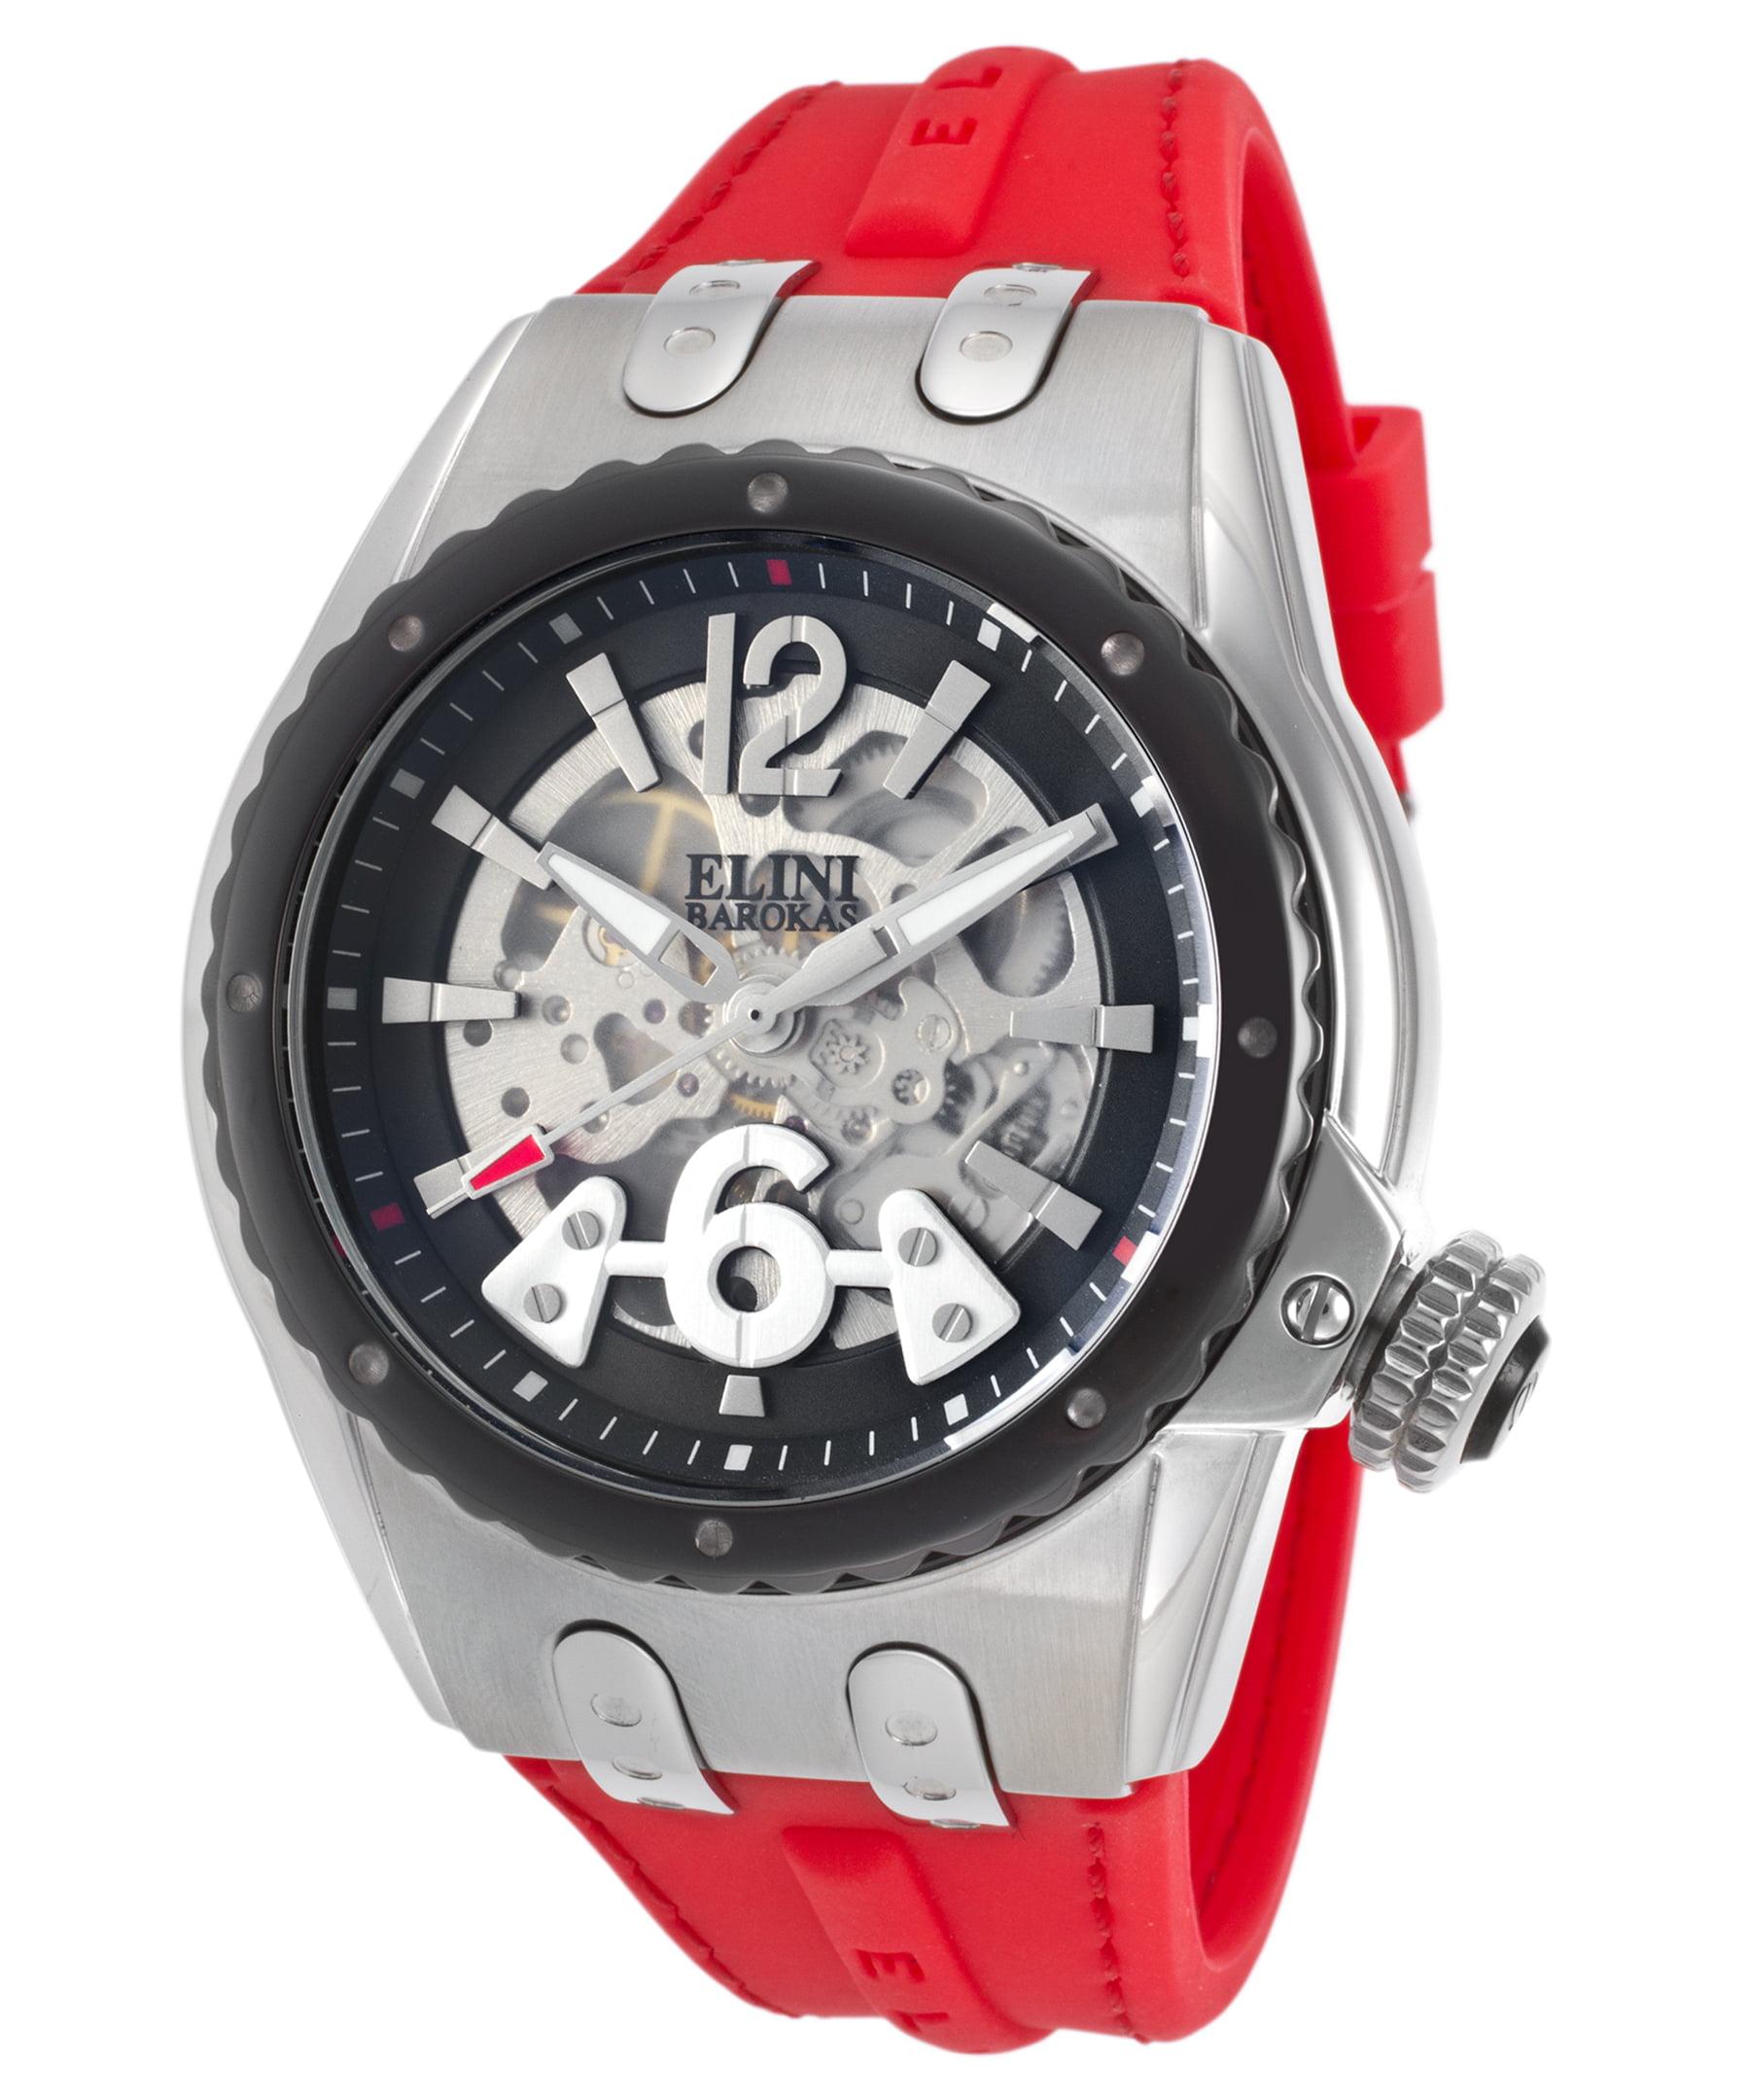 Elini Barokas 20026-01-Bb-Rds Genesis Prime Automatic Red Silicone Black Dial Watch